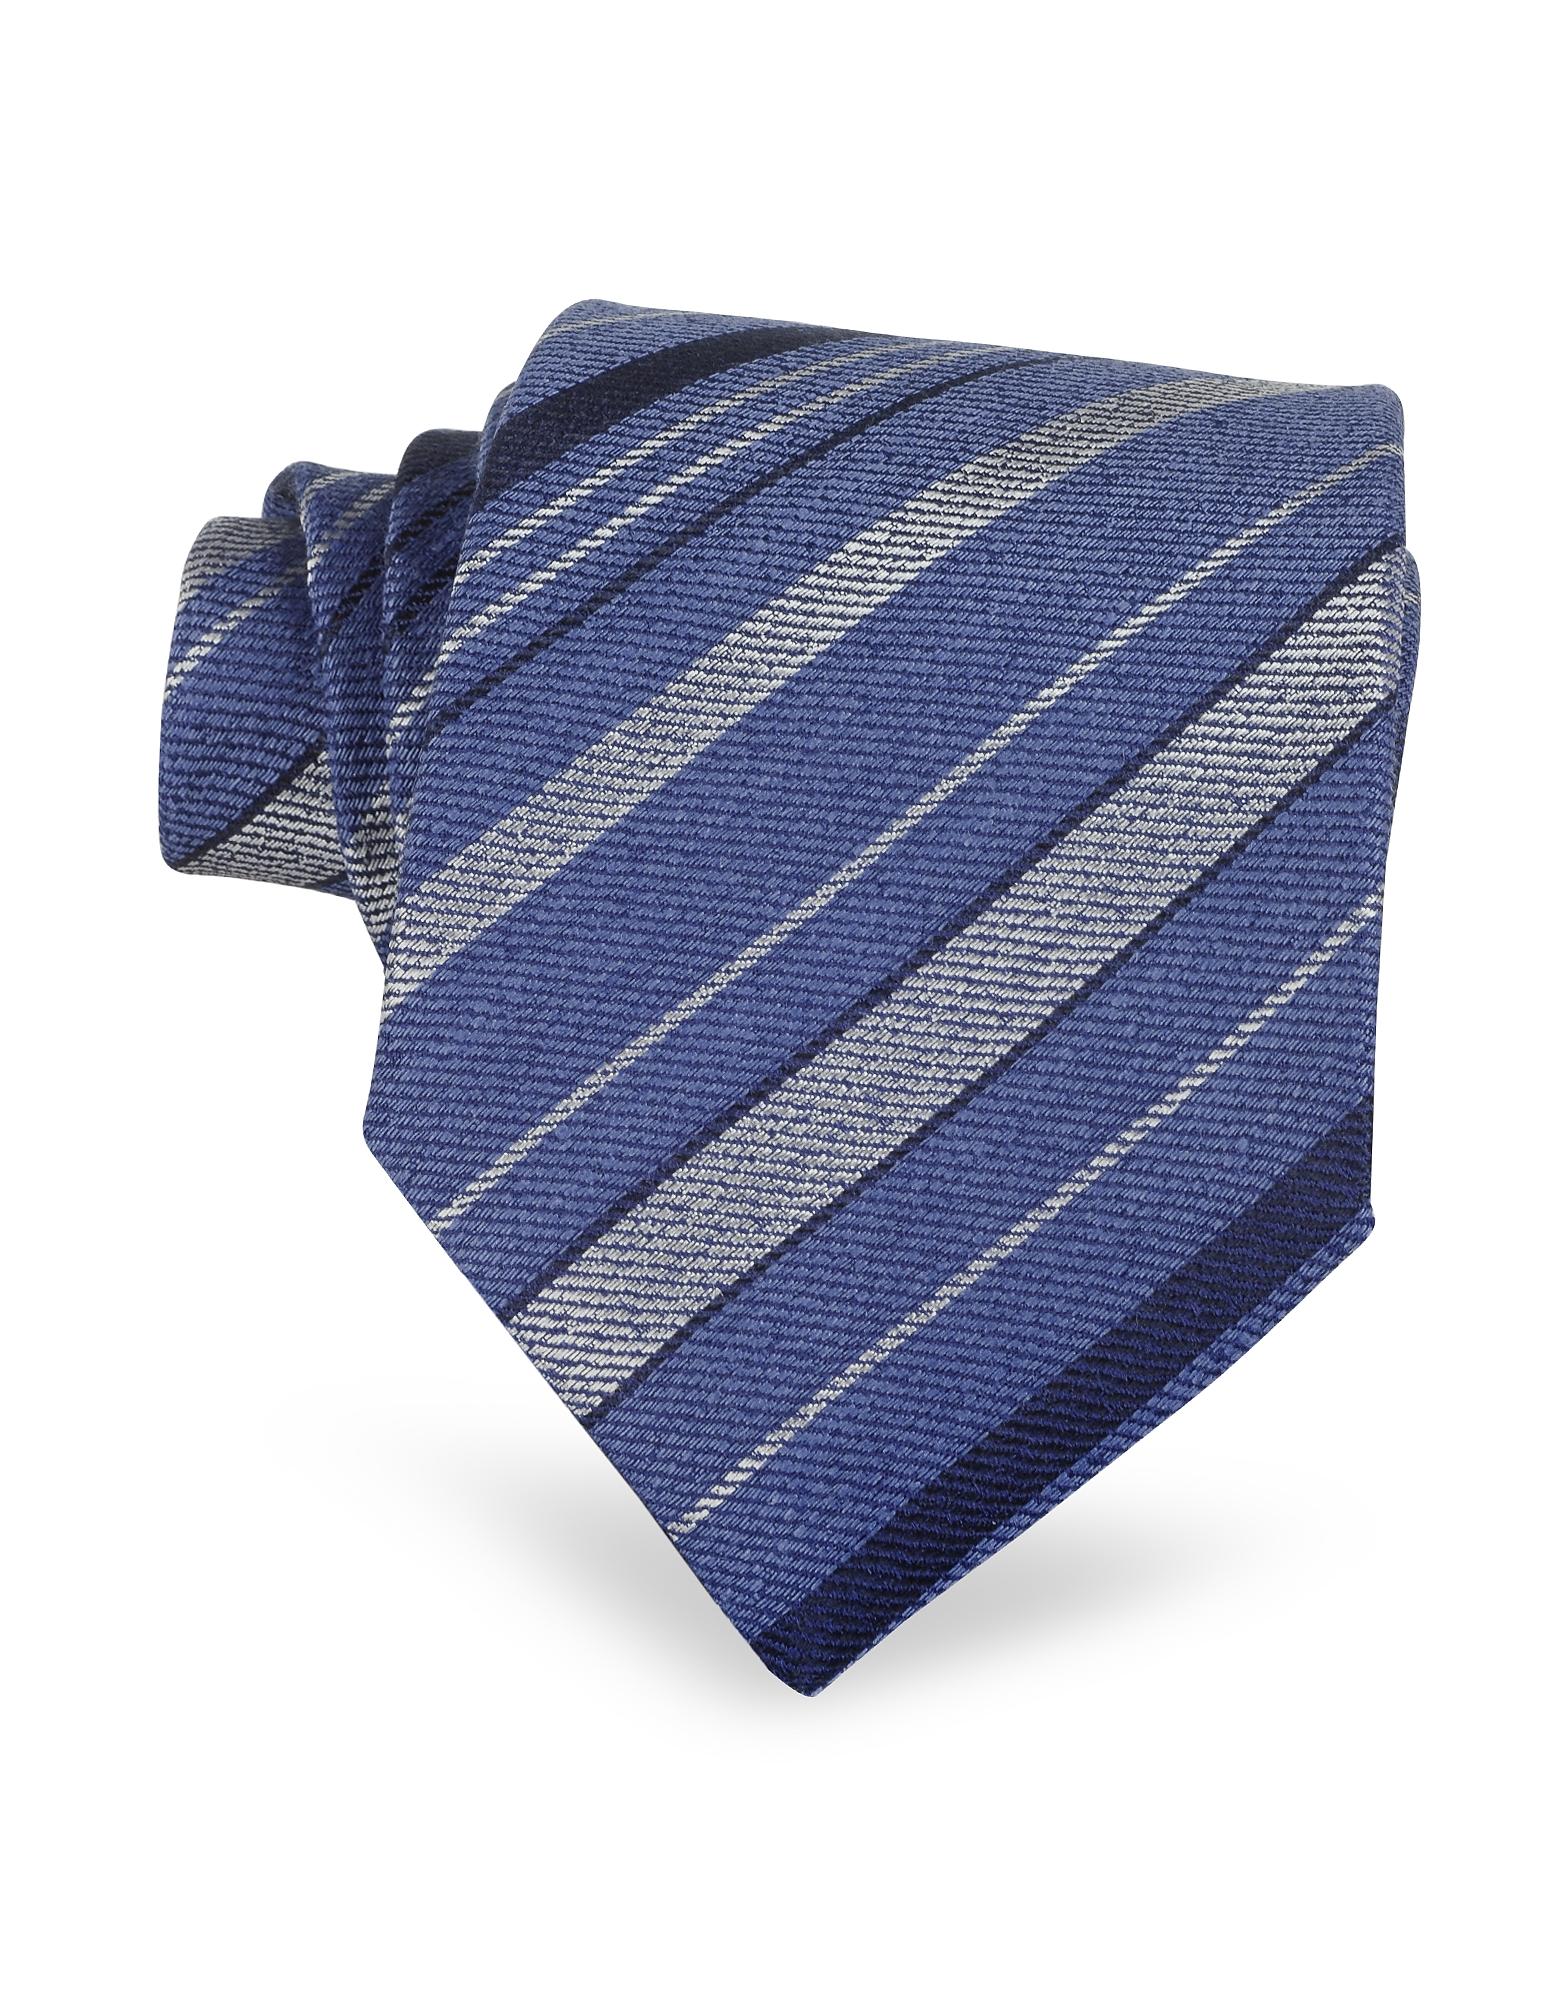 Forzieri Designer Ties, Blue Diagonal Stripe Woven Silk Tie